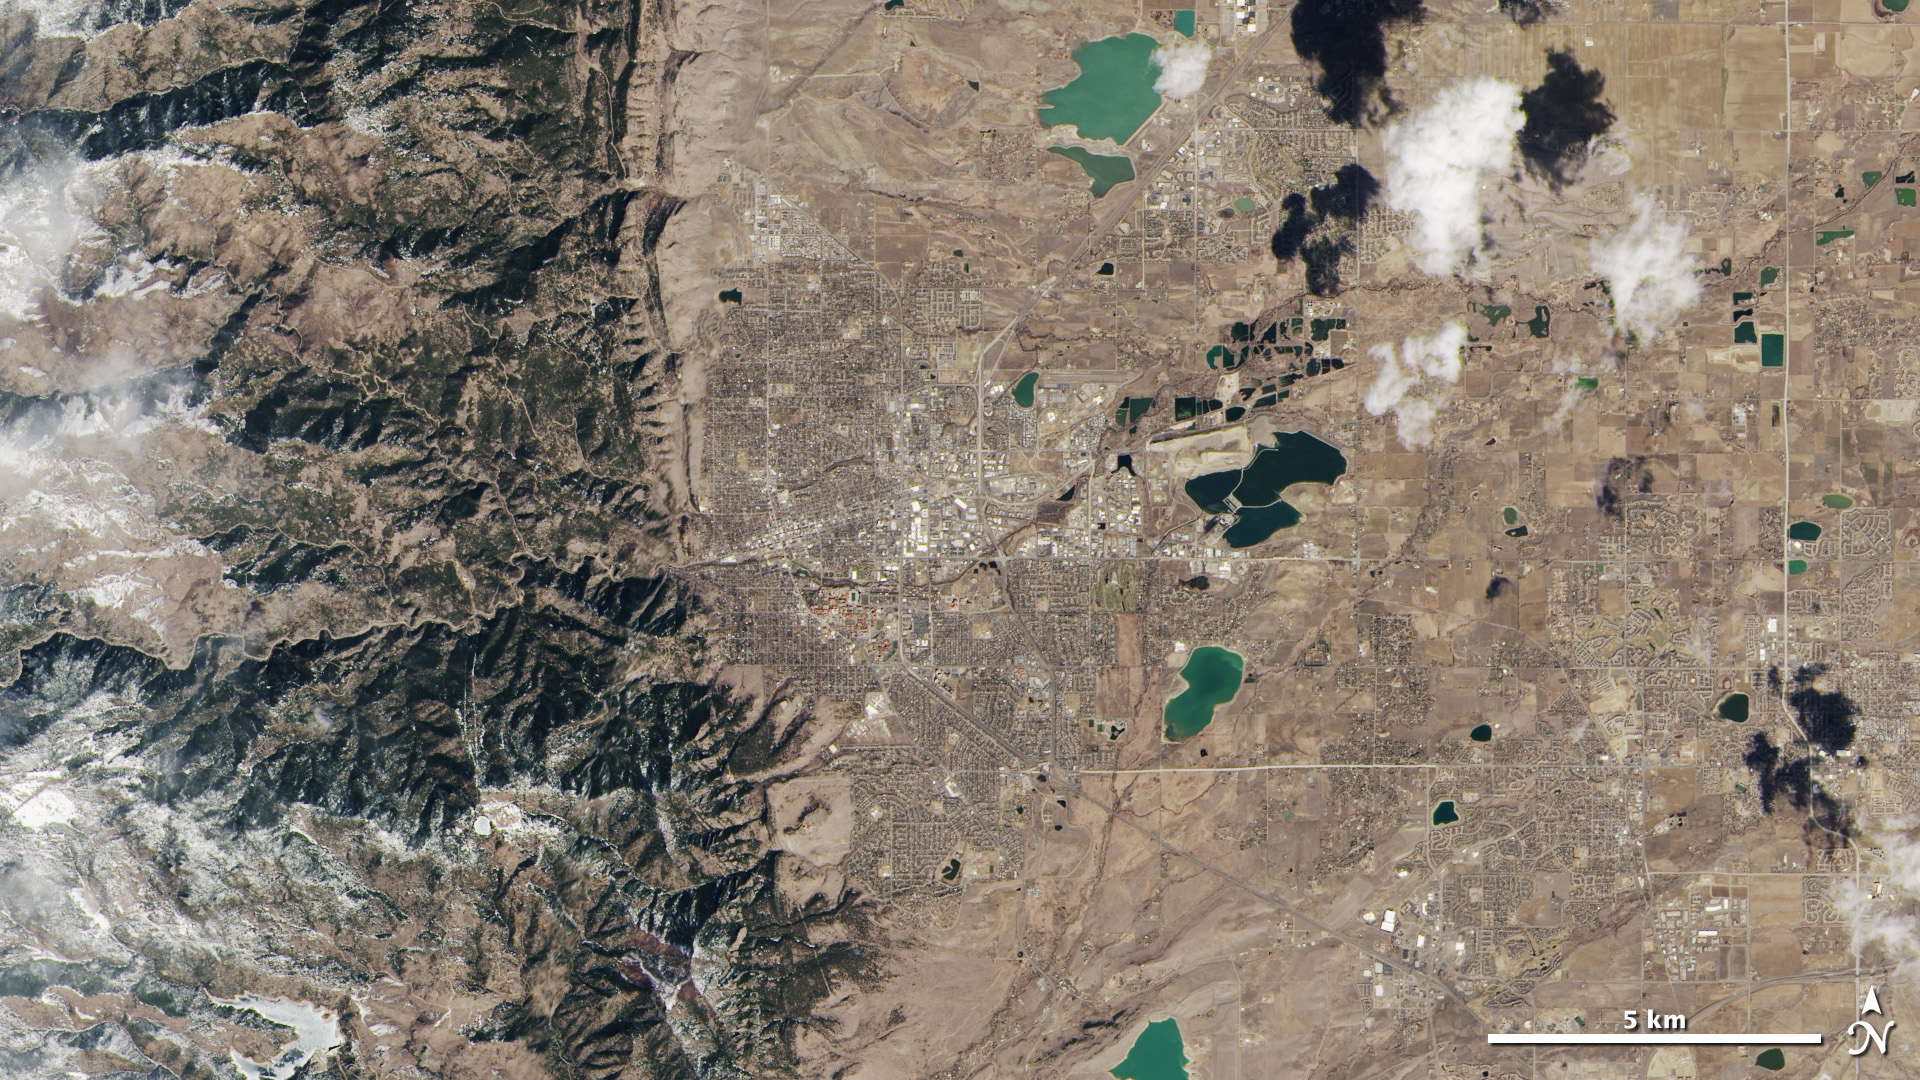 Lancement Atlas-5 • LDCM (Landsat#8) - (11/02/2013) 736127main_boulder_oli_2013077_1080_labeled-alt